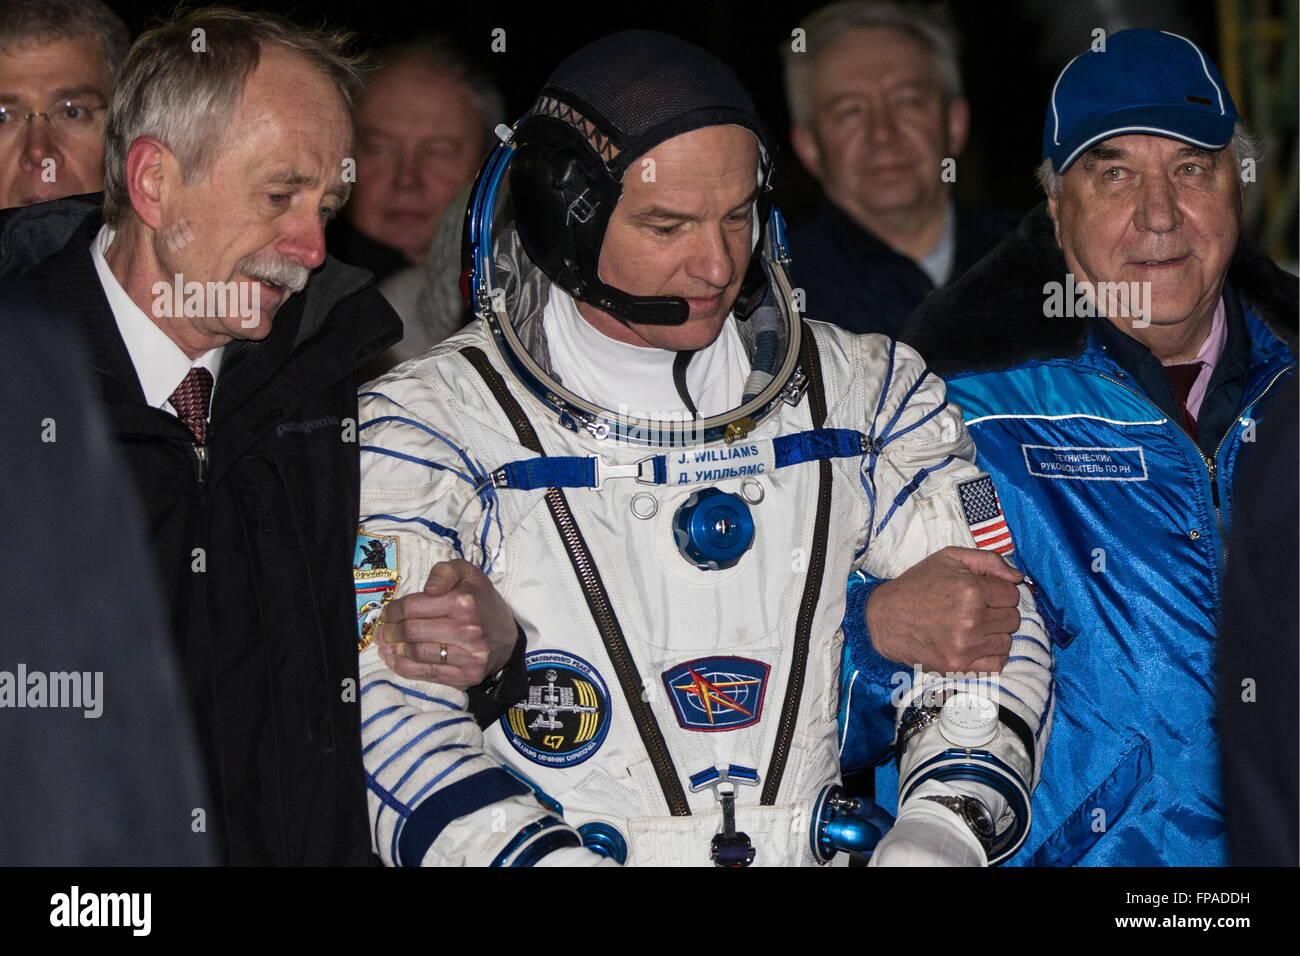 Baikonur, Kazakhstan. 18th Mar, 2016. Crew member of Expedition 47/48, NASA astronaut Jeffrey Jeff Williams, (C) - Stock Image